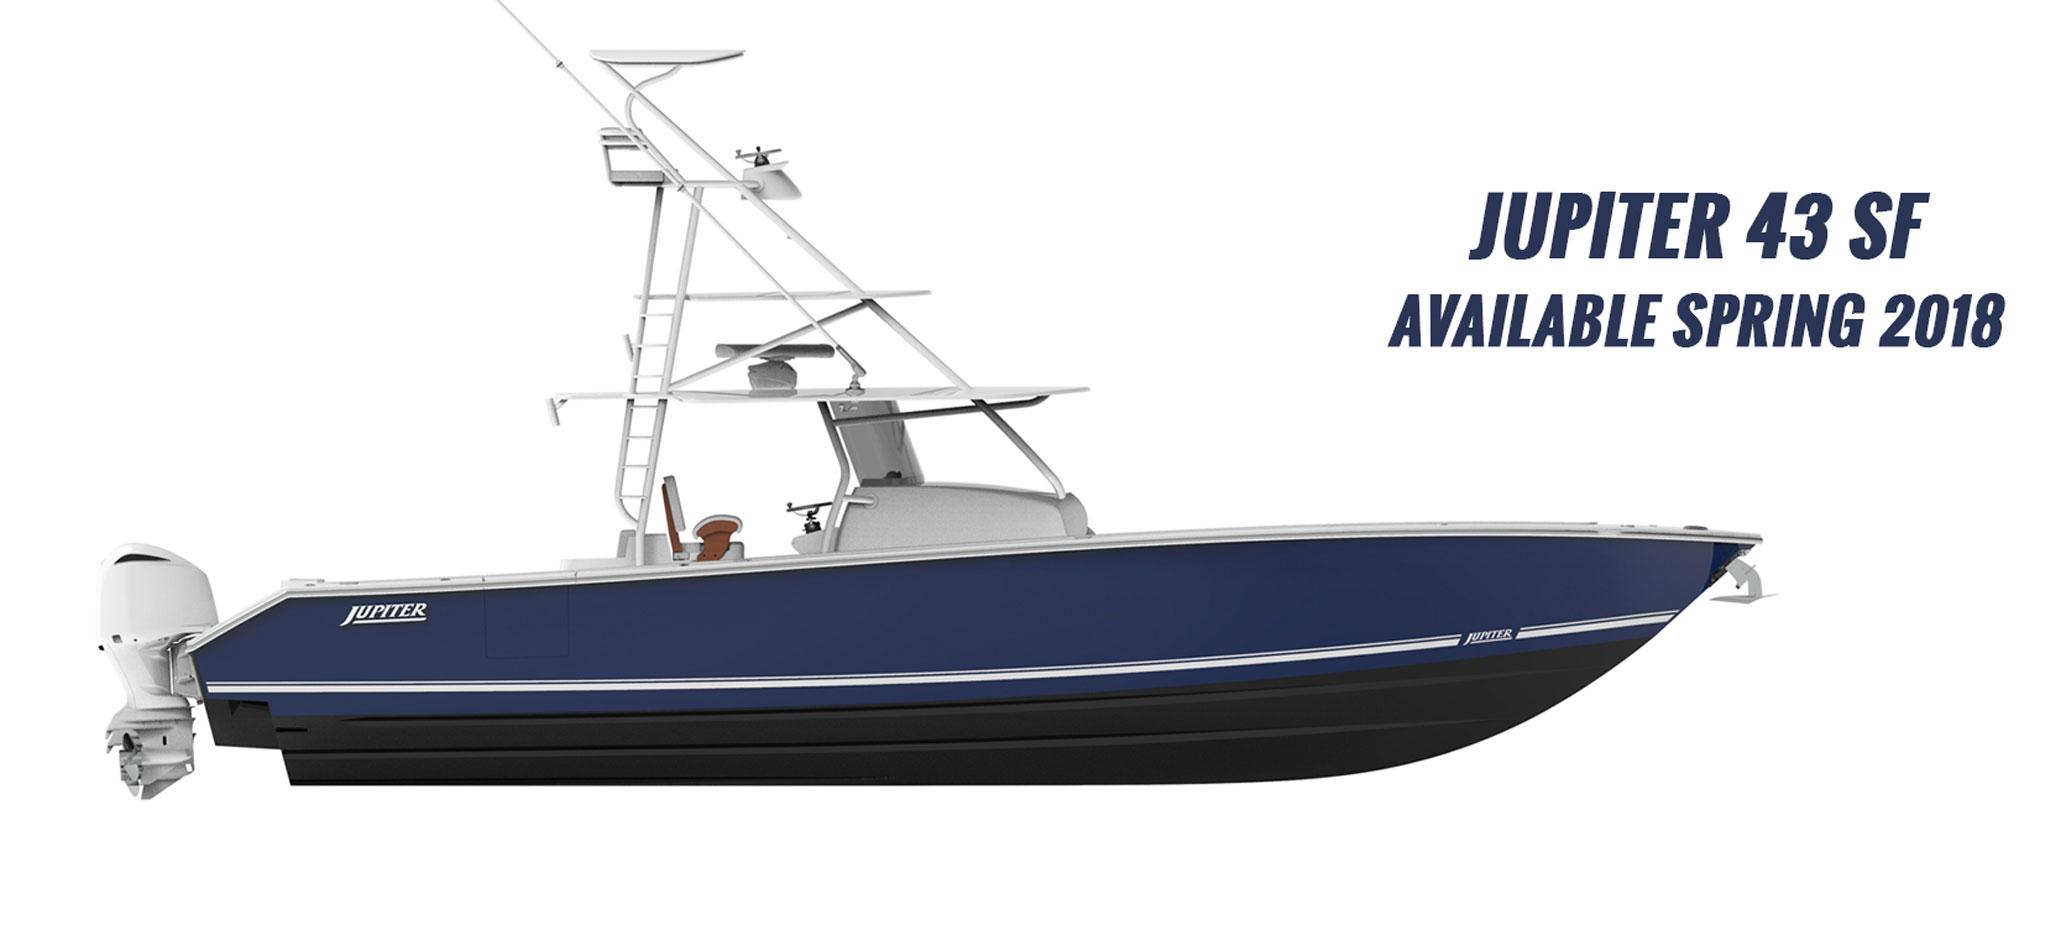 New Smyrna Beach Yamaha Marine Dealer